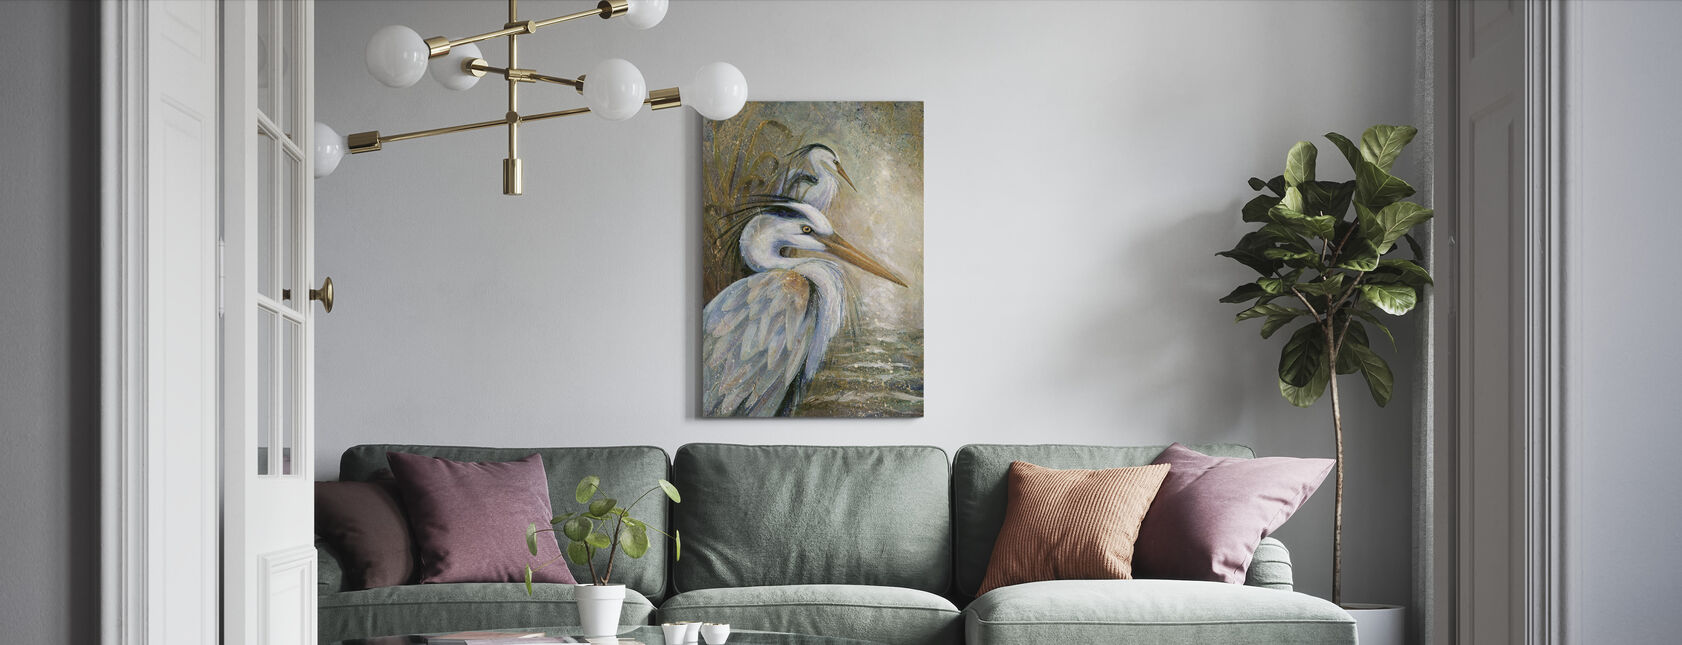 Peace In Stillness - Canvas print - Living Room